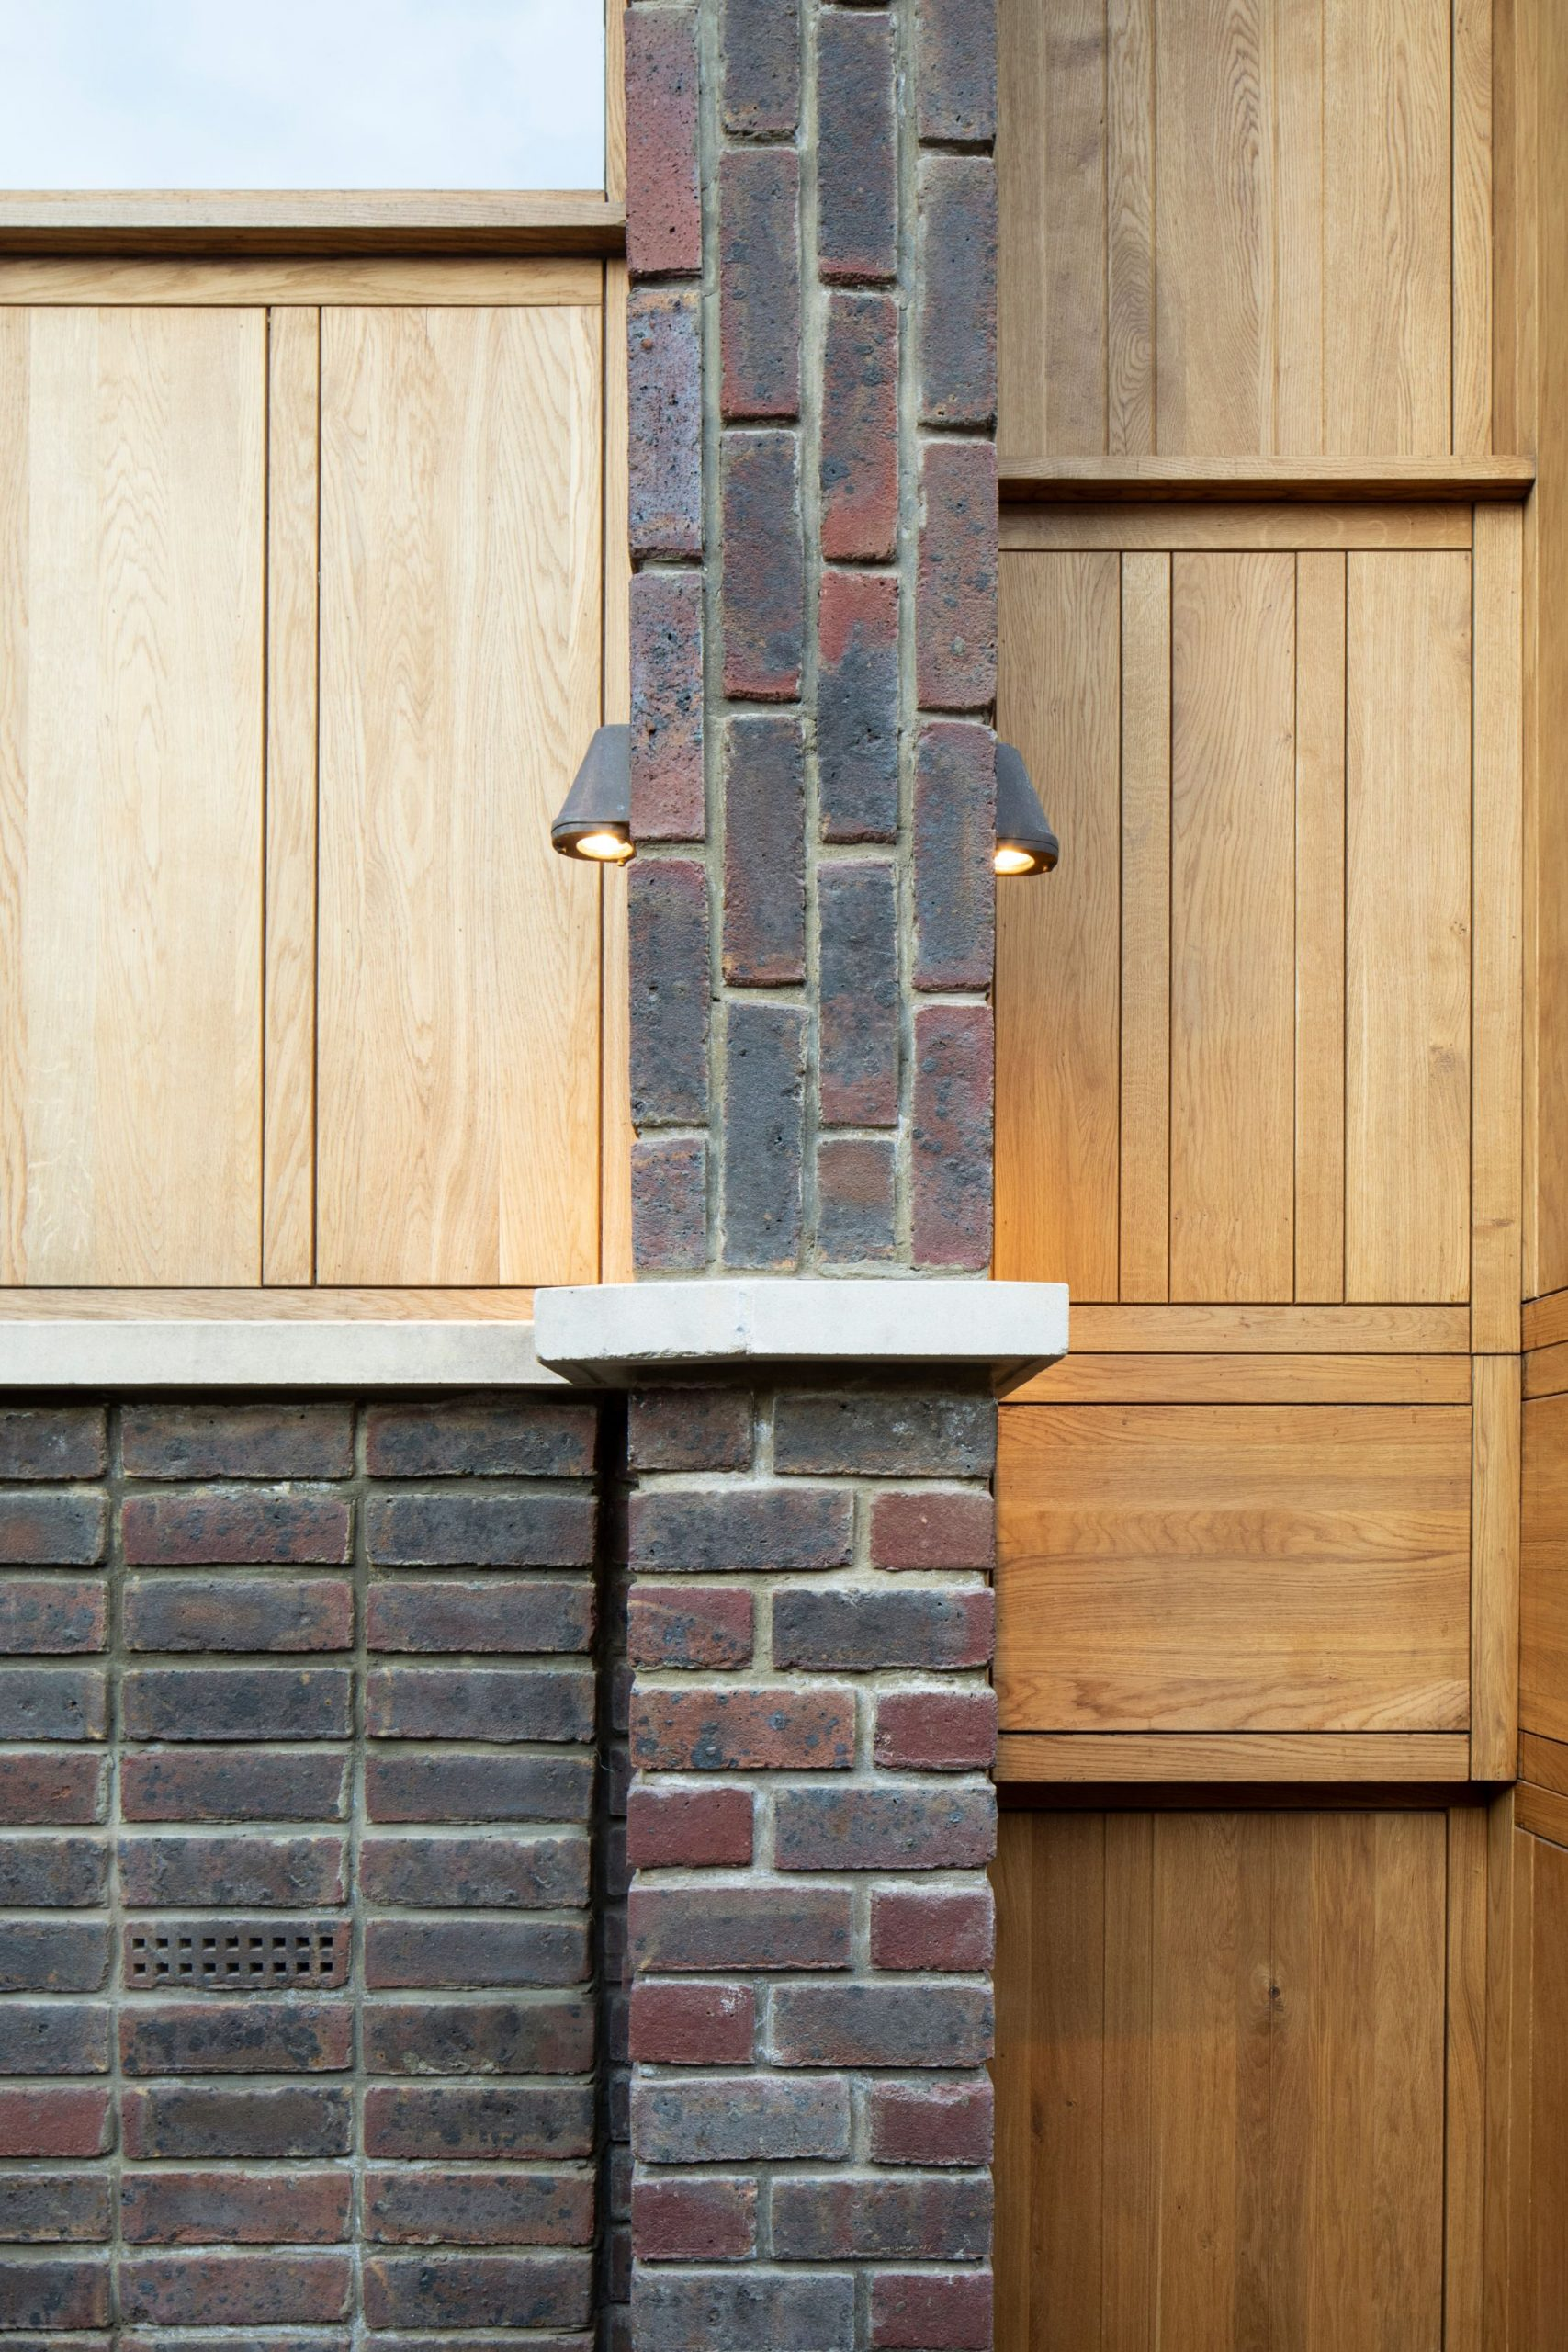 Brick_house41